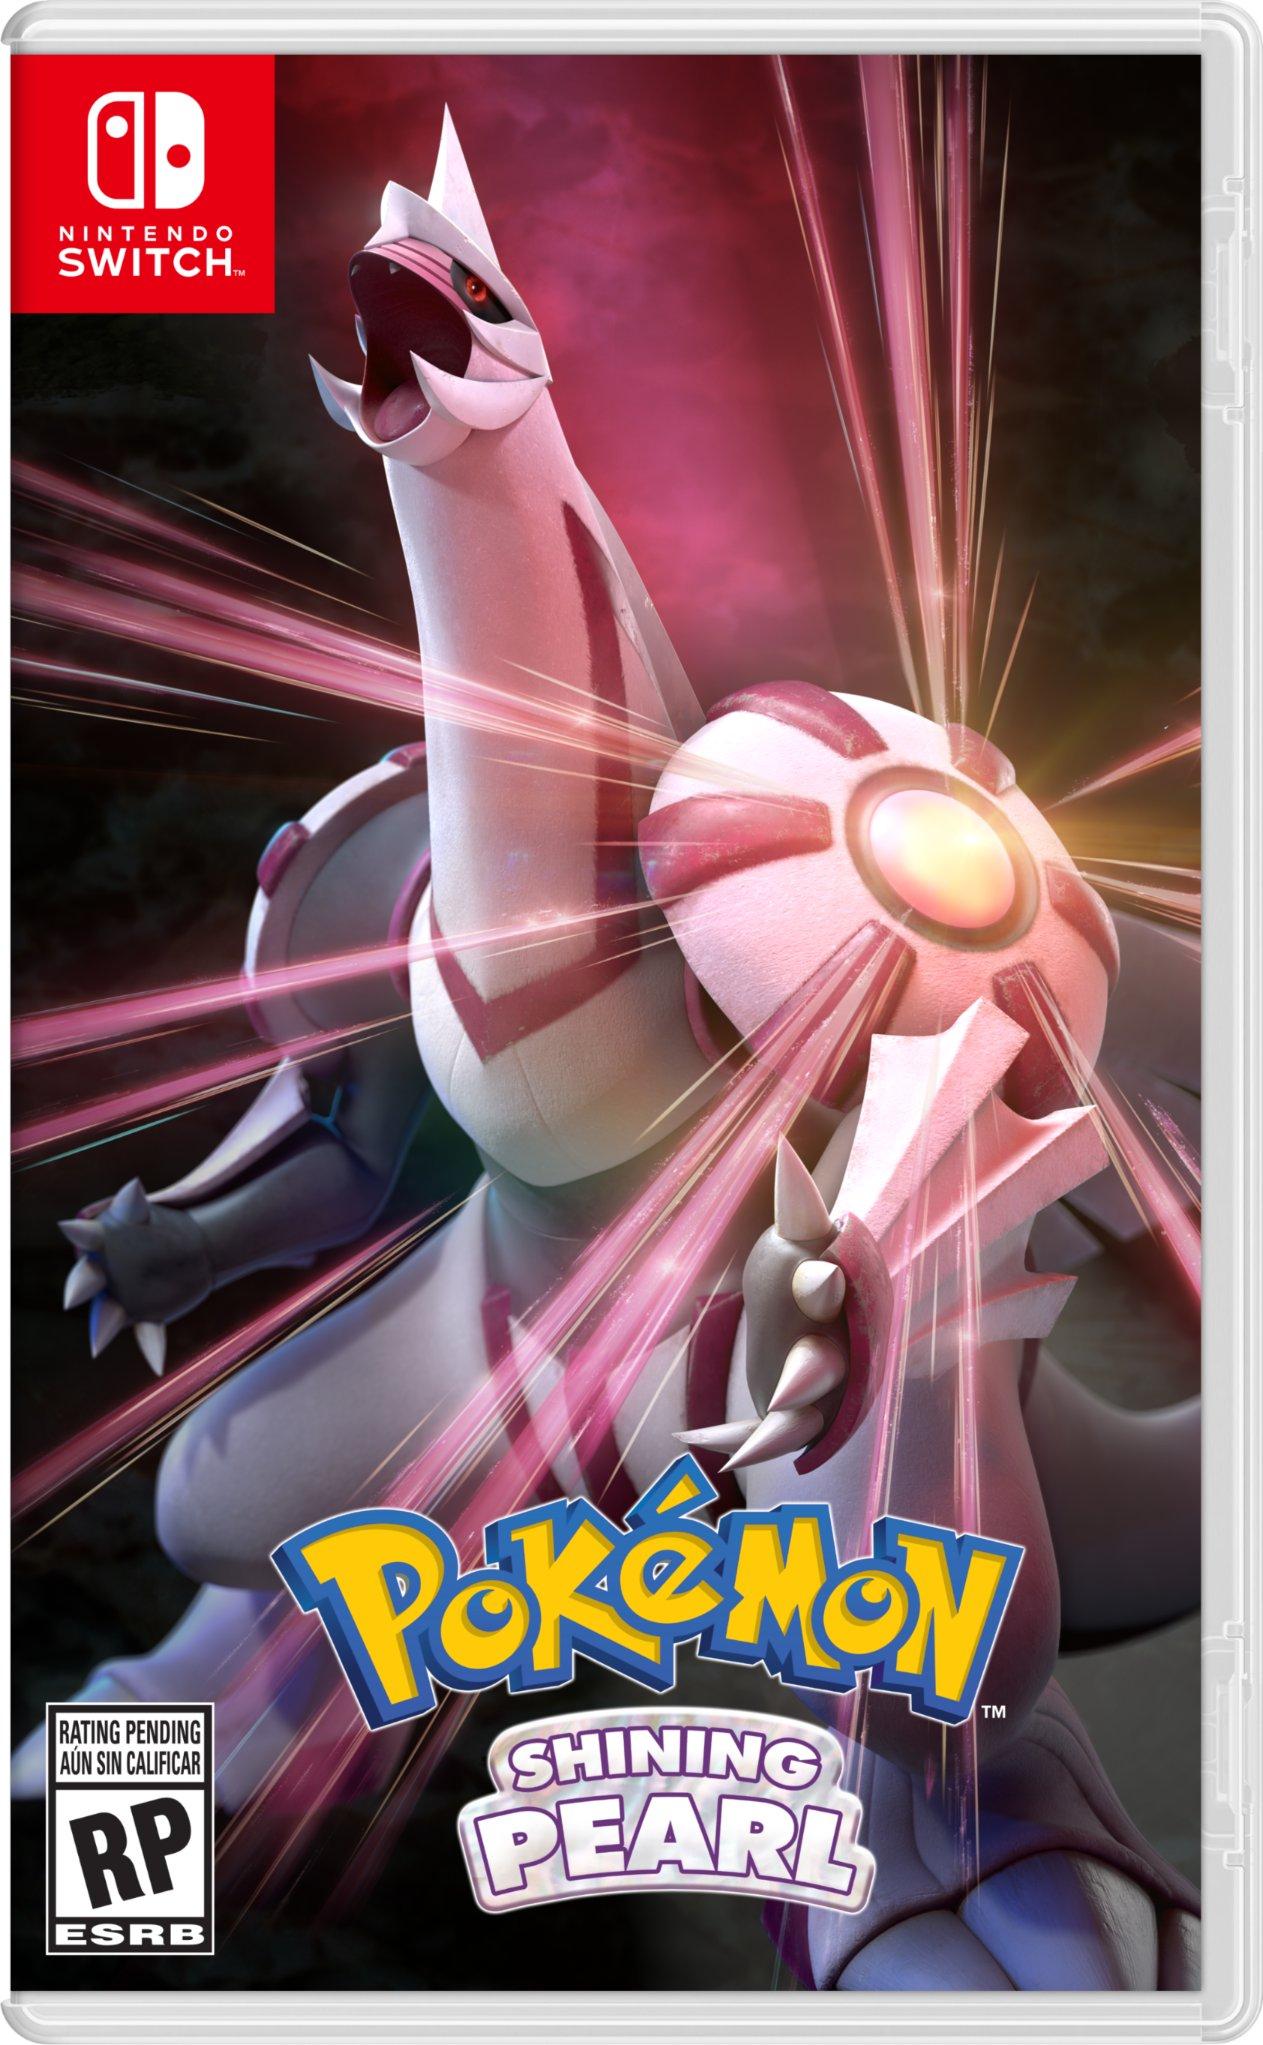 Pokémon Diamant Etincelant / Perle Scintillante E2USKbmXMAIa6ni?format=jpg&name=large